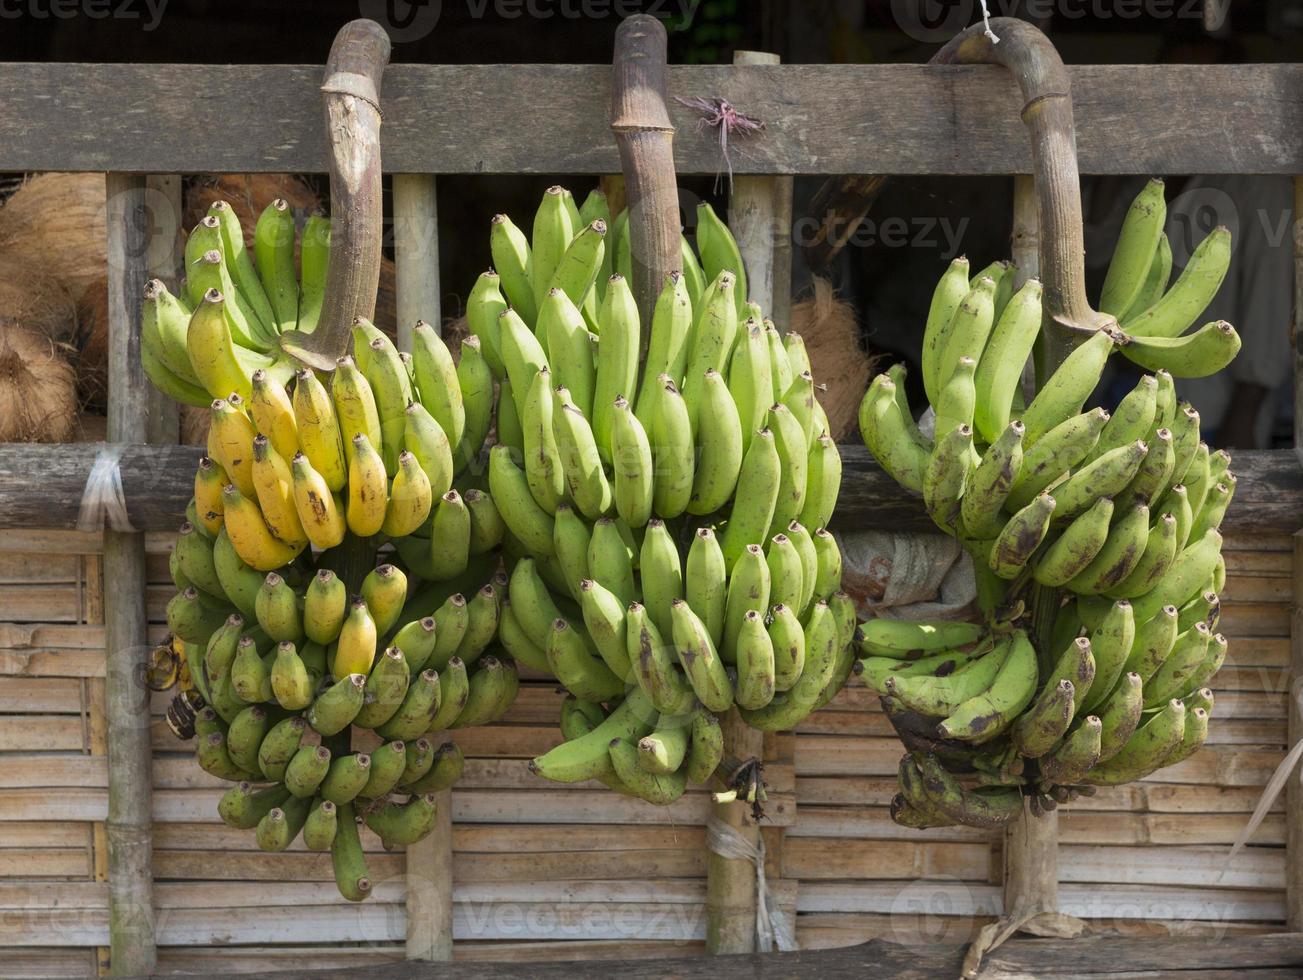 grappoli di banane al mercato all'ingrosso, Yangon, Myanmar foto